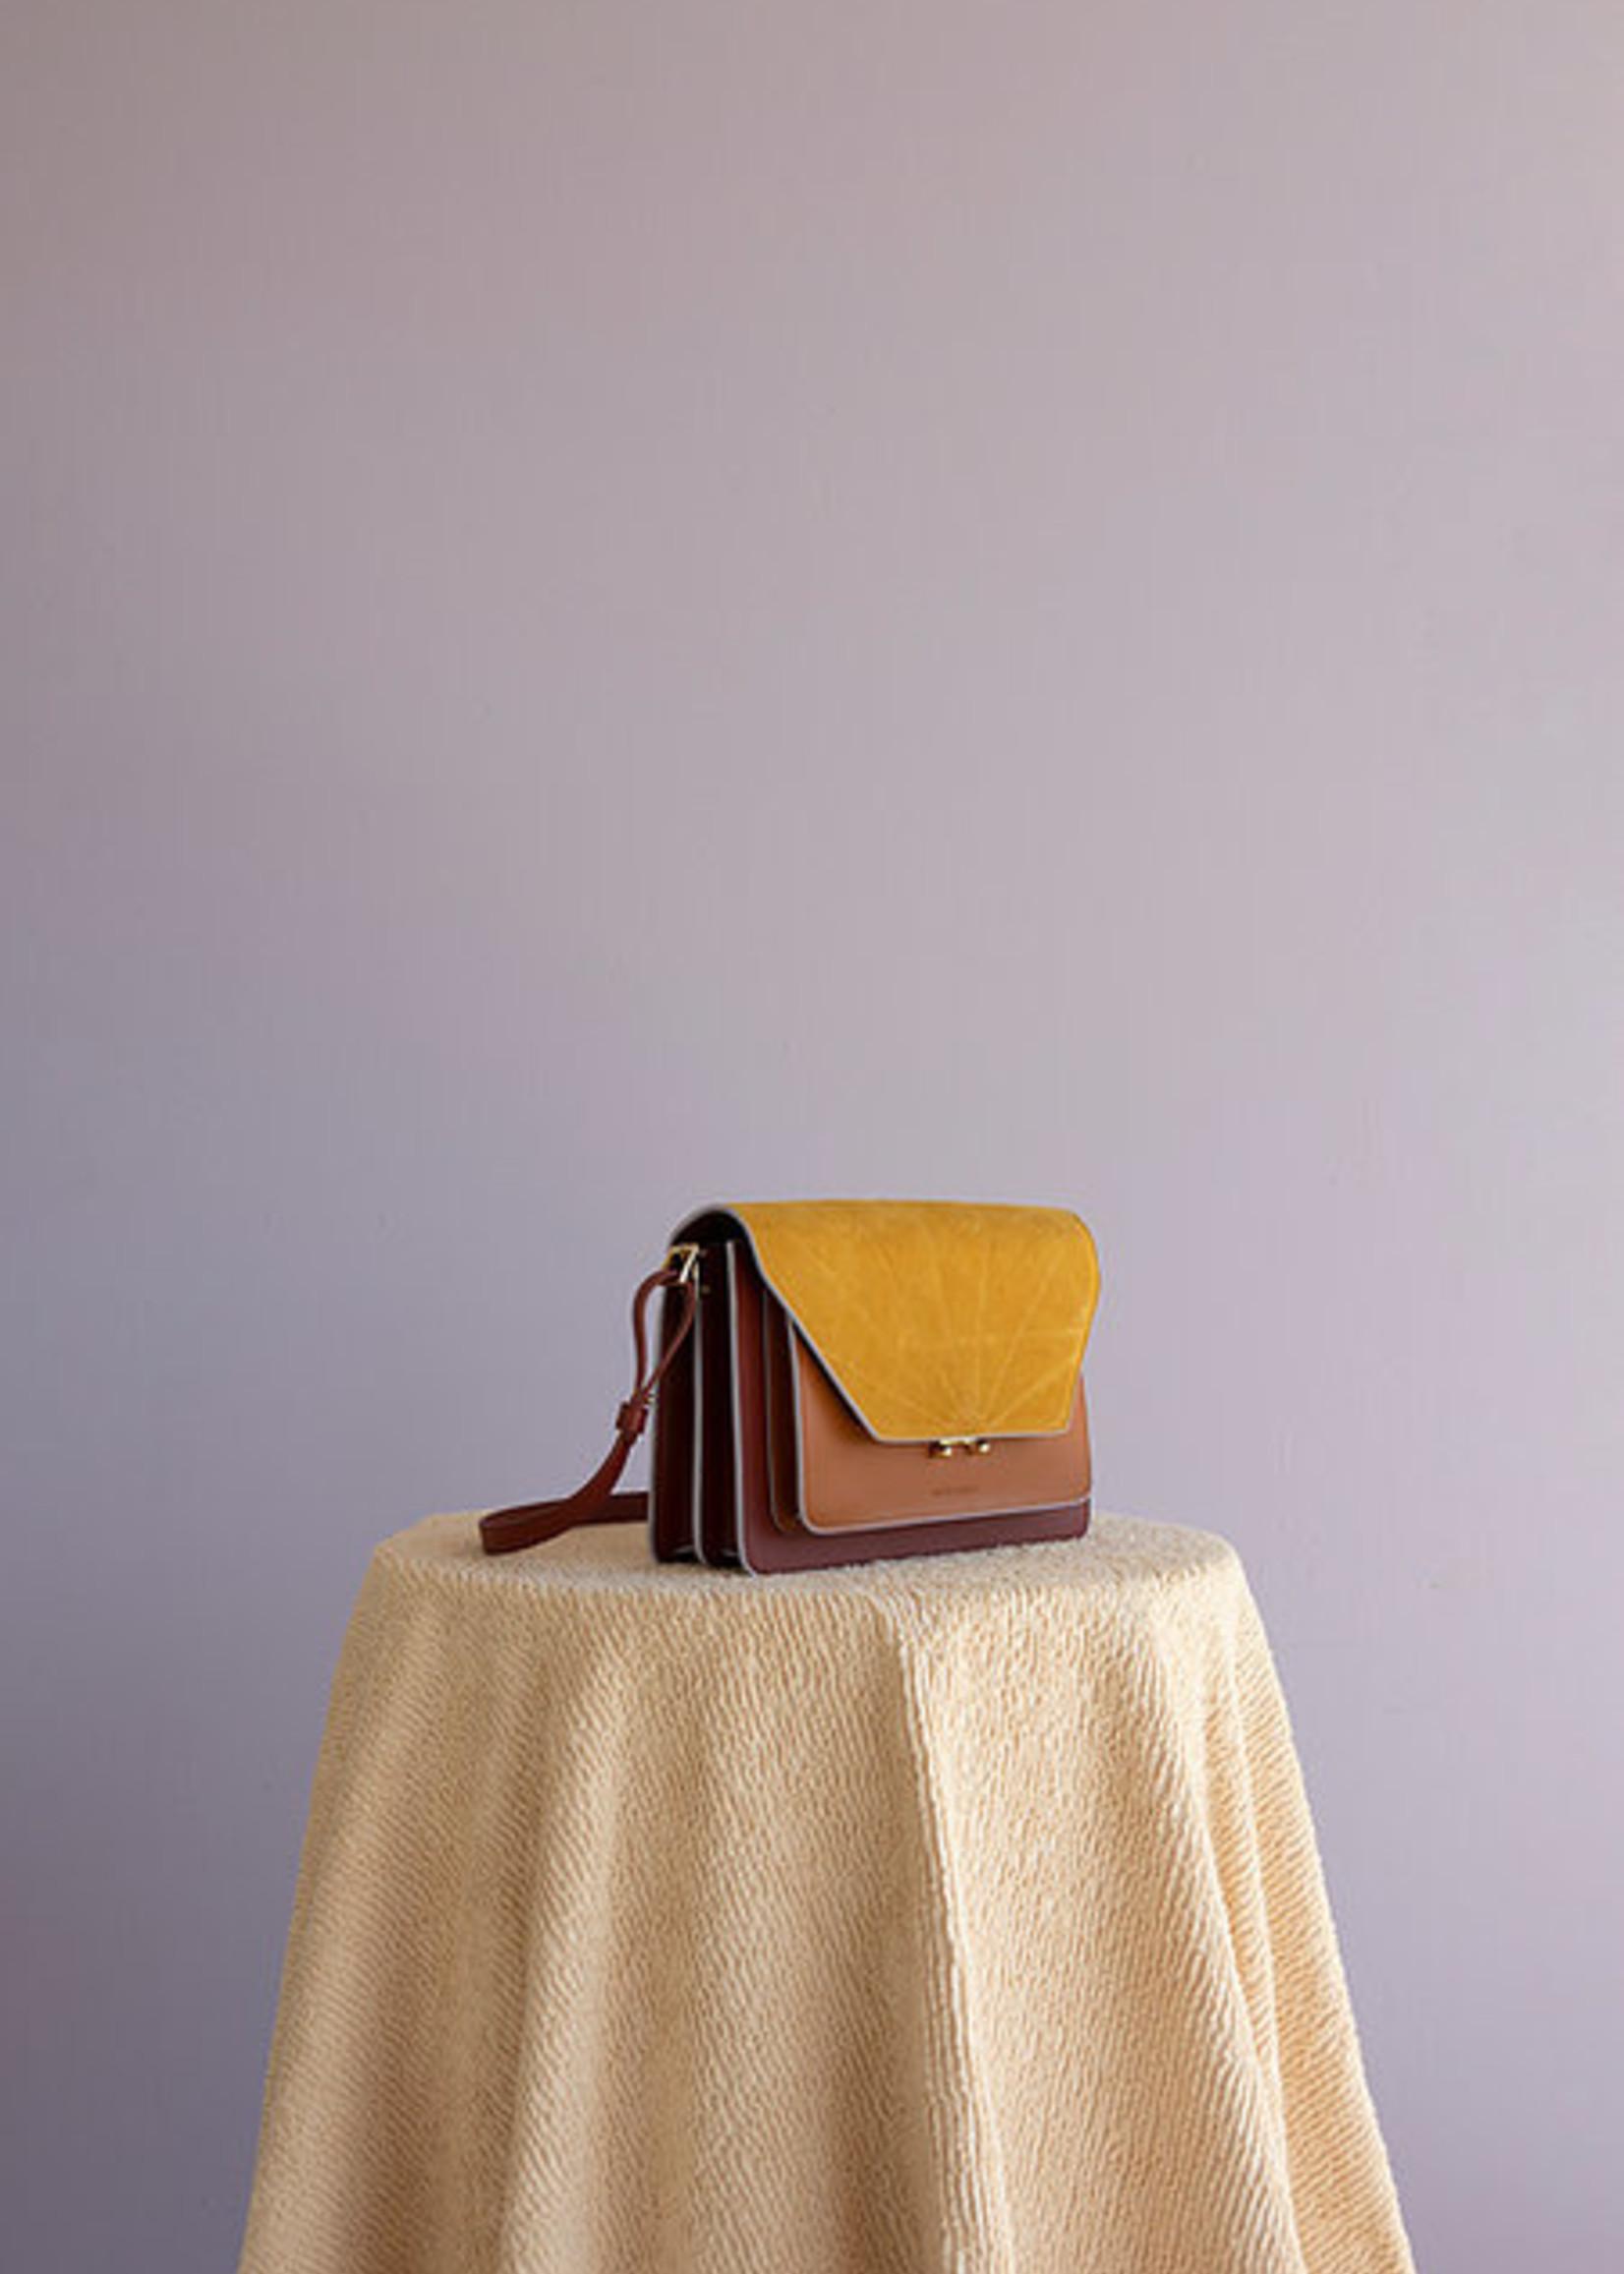 Sticky Lemon Schoudertas - Coloré - Brick Red + Sunset Orange + Honey Gold